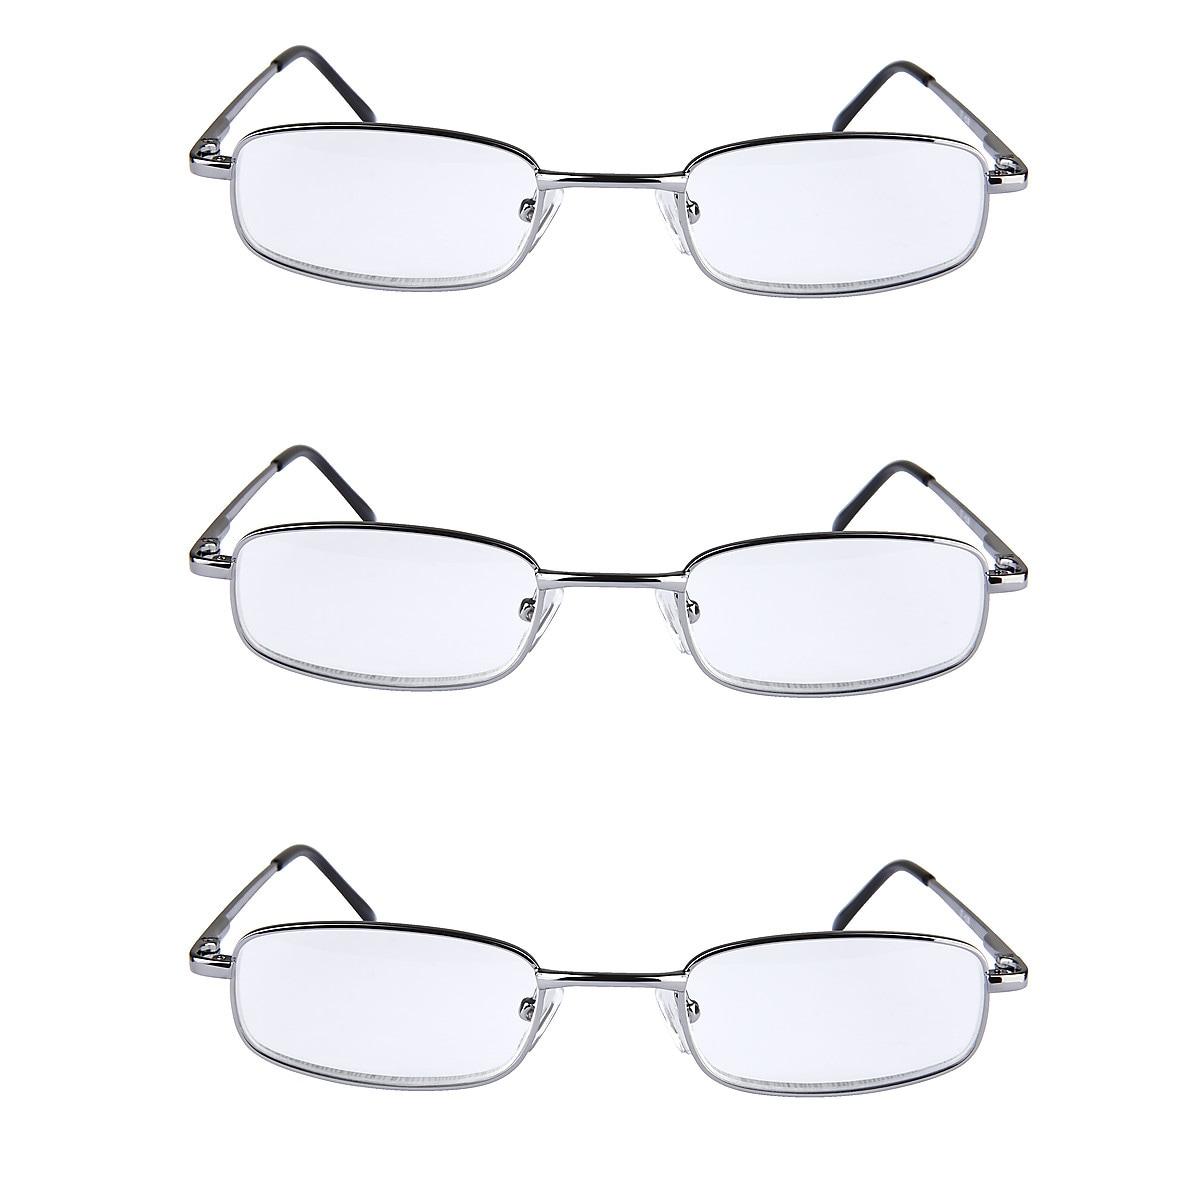 Pack of 3, Metal Reading Glasses